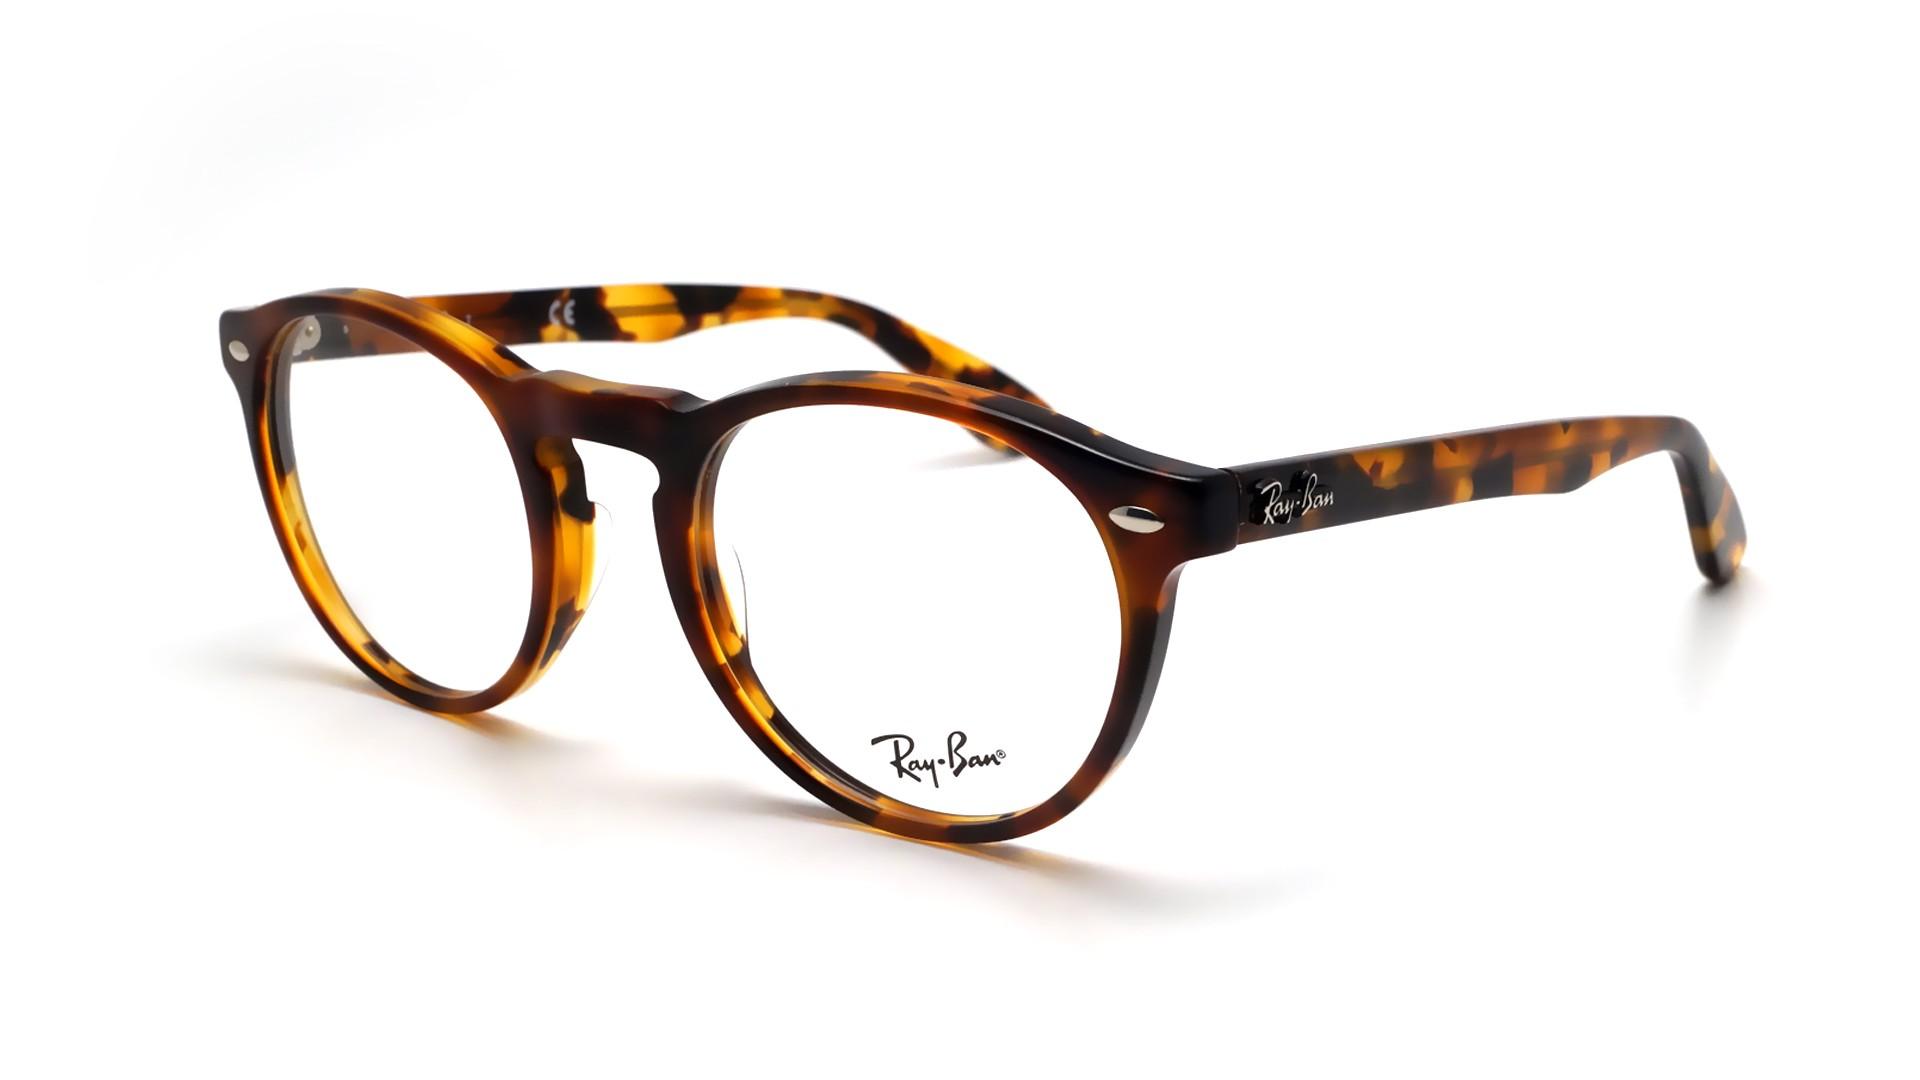 f291cf16a52a6 Eyeglasses Ray-Ban RX5283 RB5283 5675 49-21 Tortoise Small